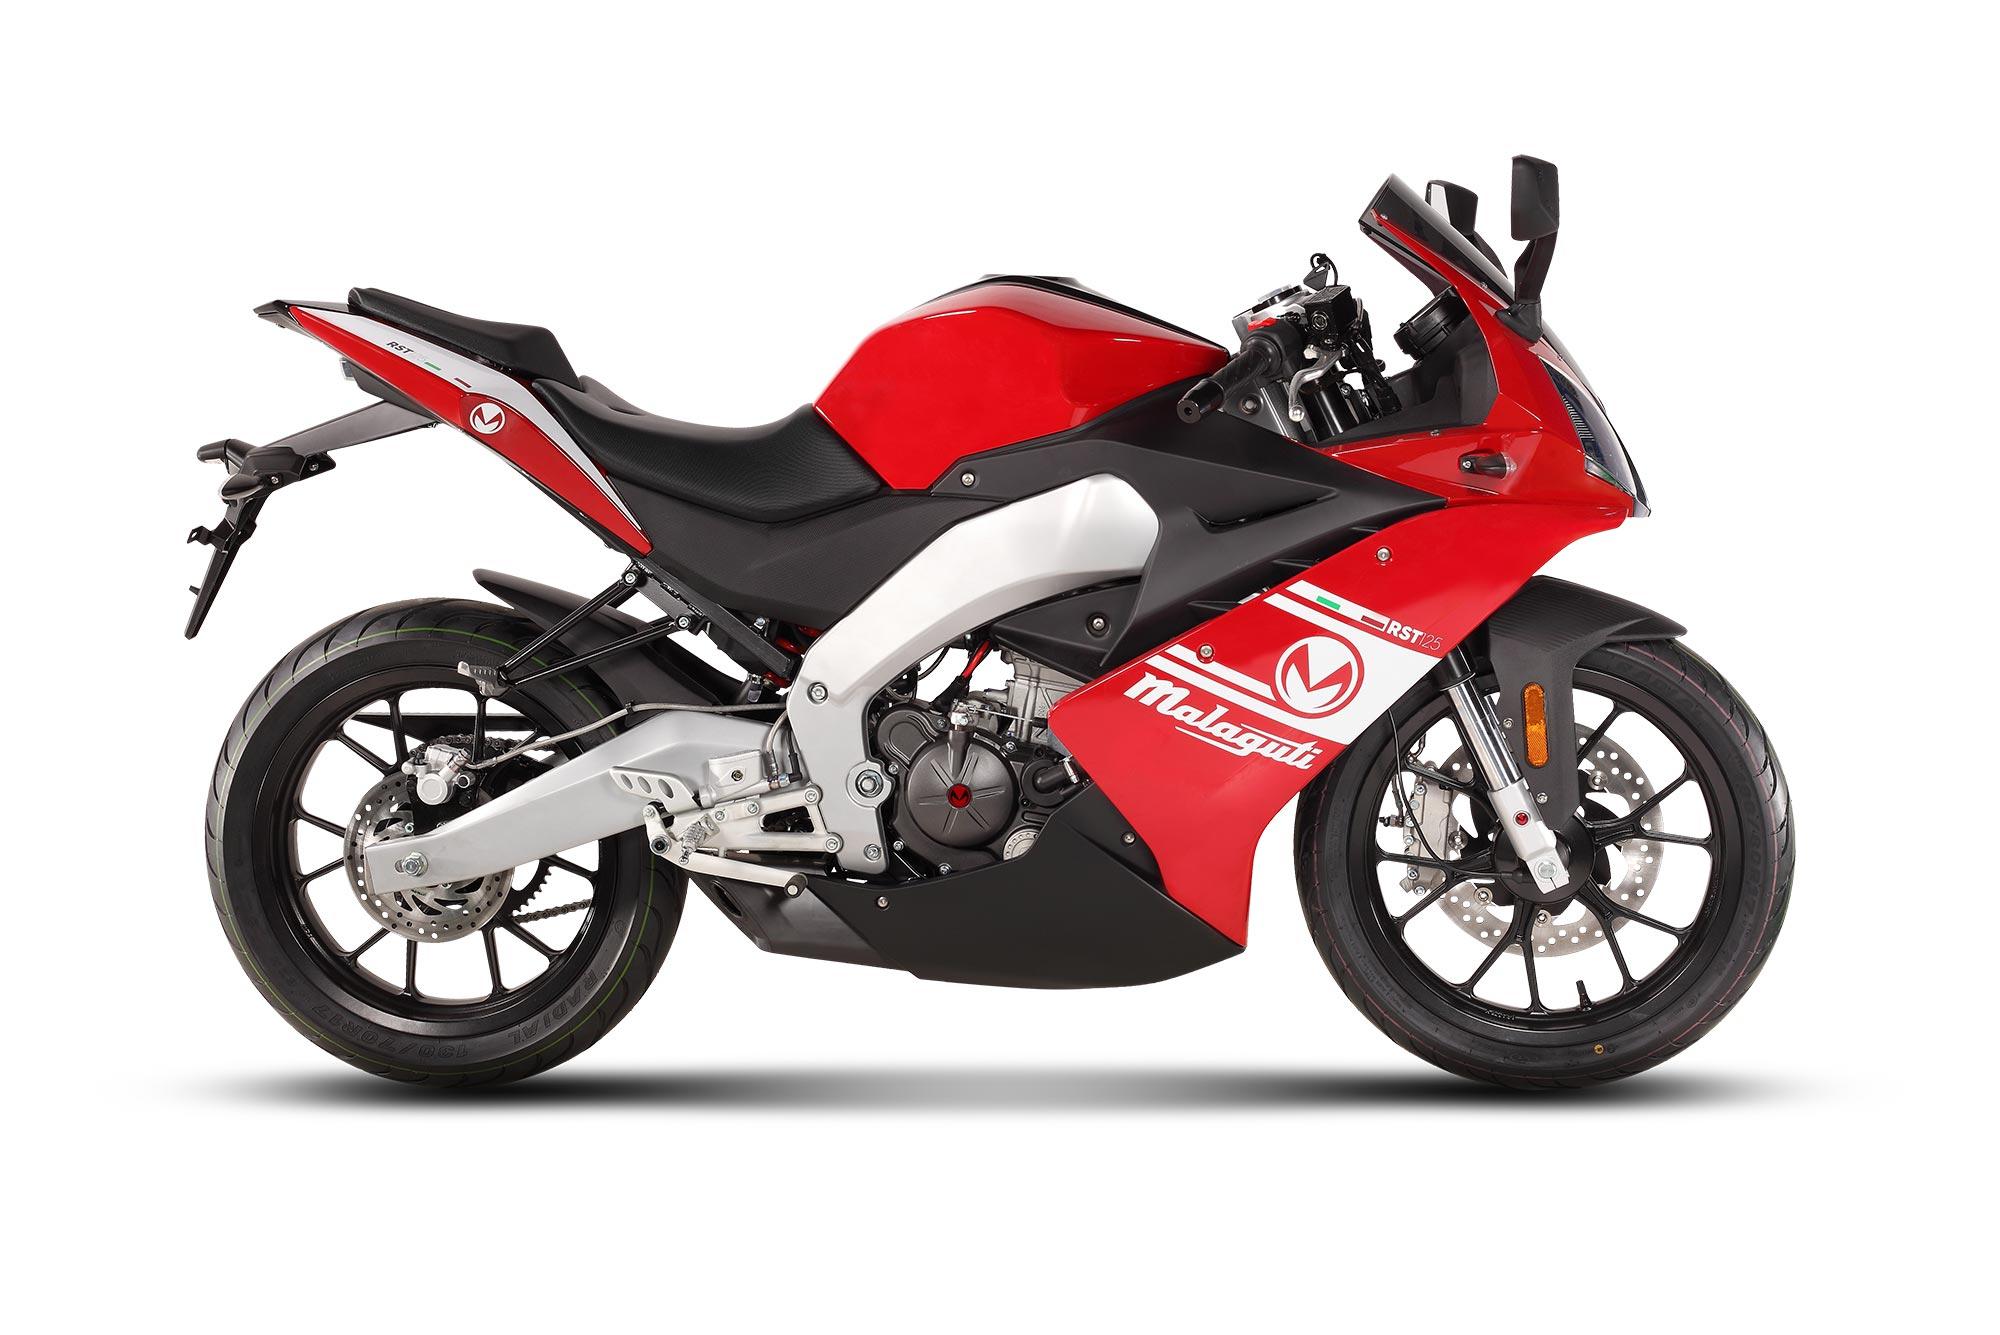 125 malaguti rst 125 m  s que motos tenerife 125cc motorcycle malaguti rst 125 m  s que motos tenerife